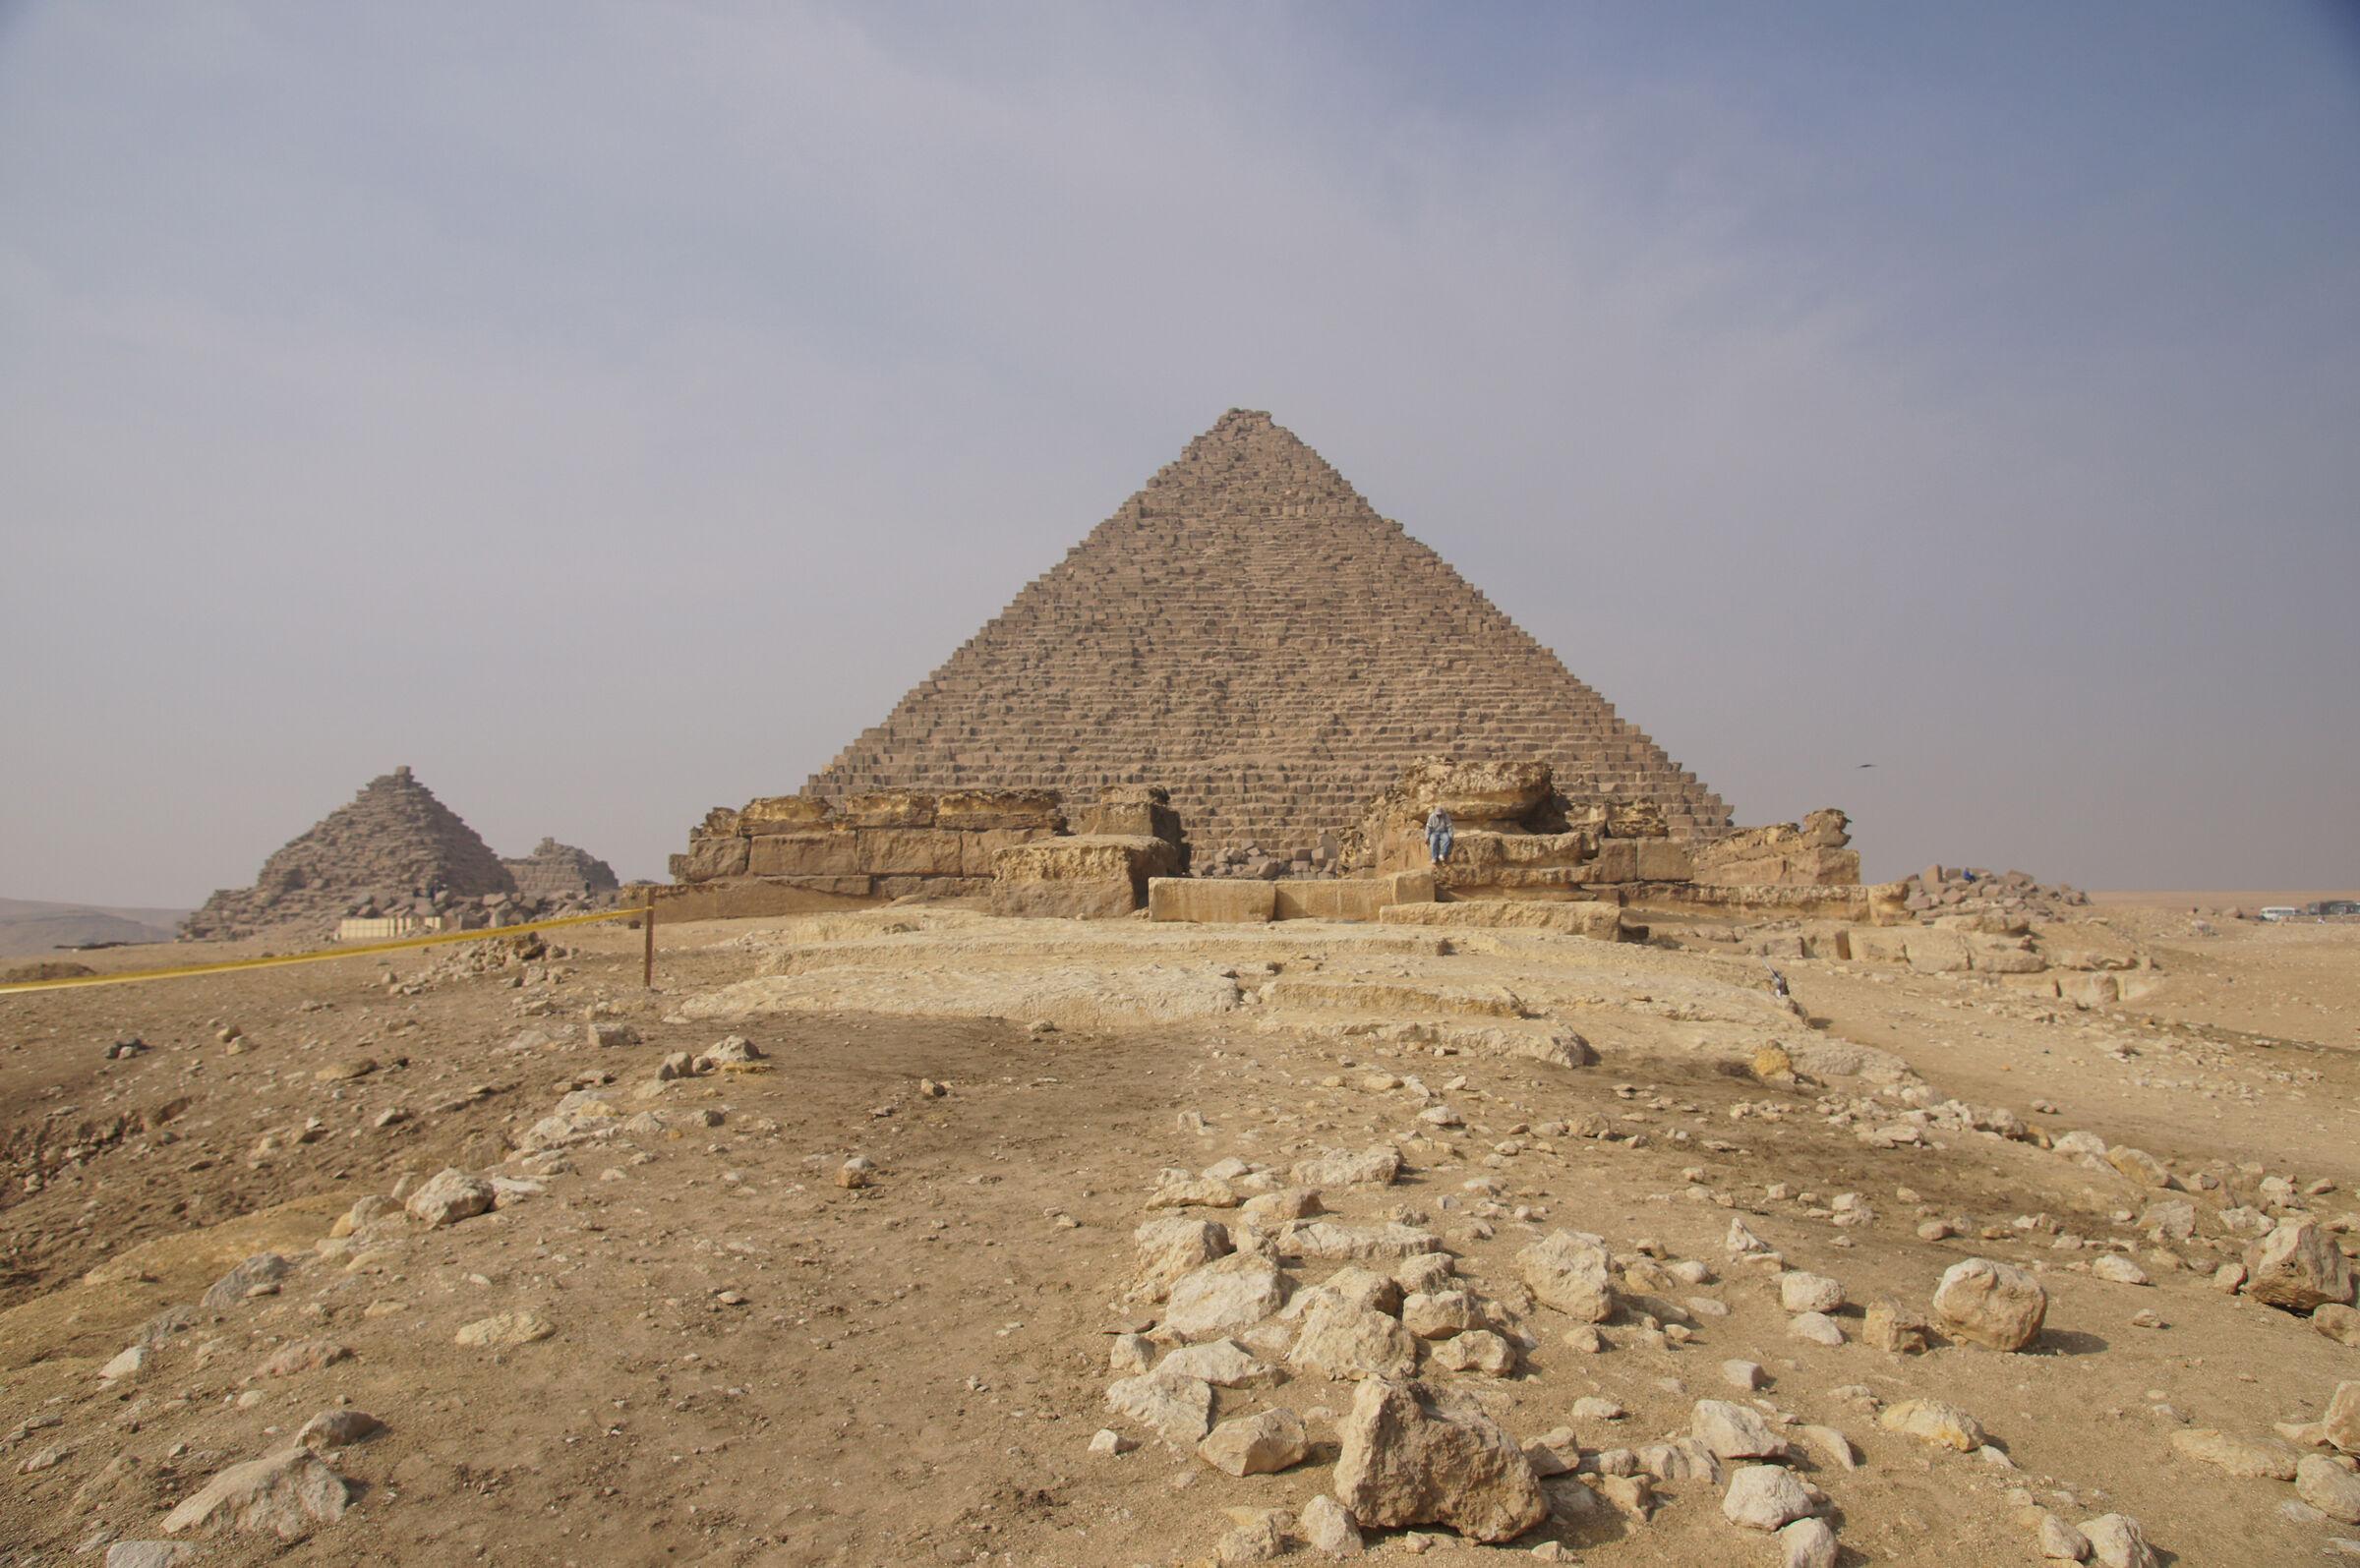 Menkaure Pyramid Complex: Site: Giza; View: Menkaure Pyramid, Menkaure Causeway, Menkaure Pyramid Temple, G III-a, G III-b